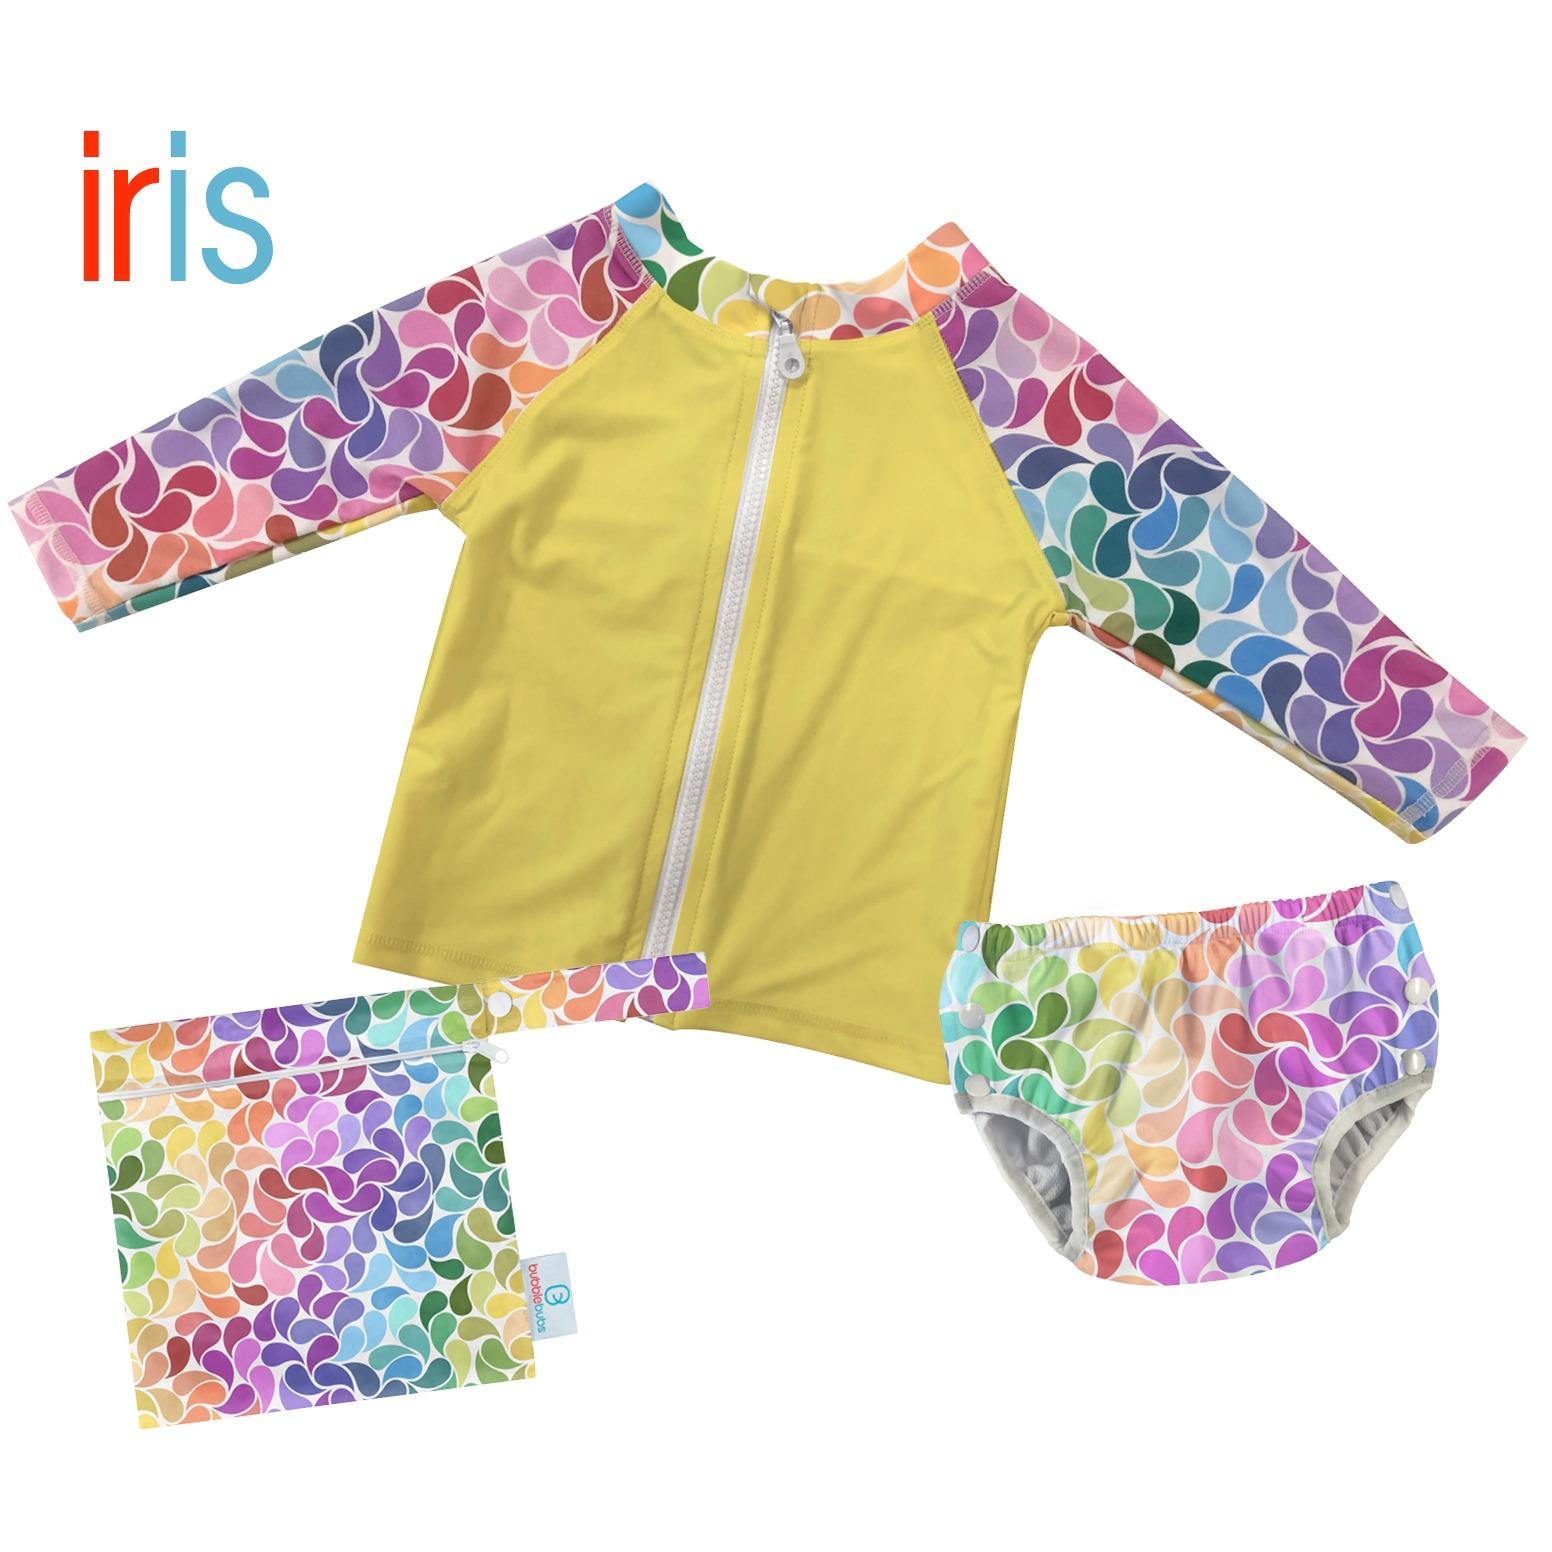 droplet-reusable-swim-cloth-nappy-with-wetbag-and-swim-vest-iris